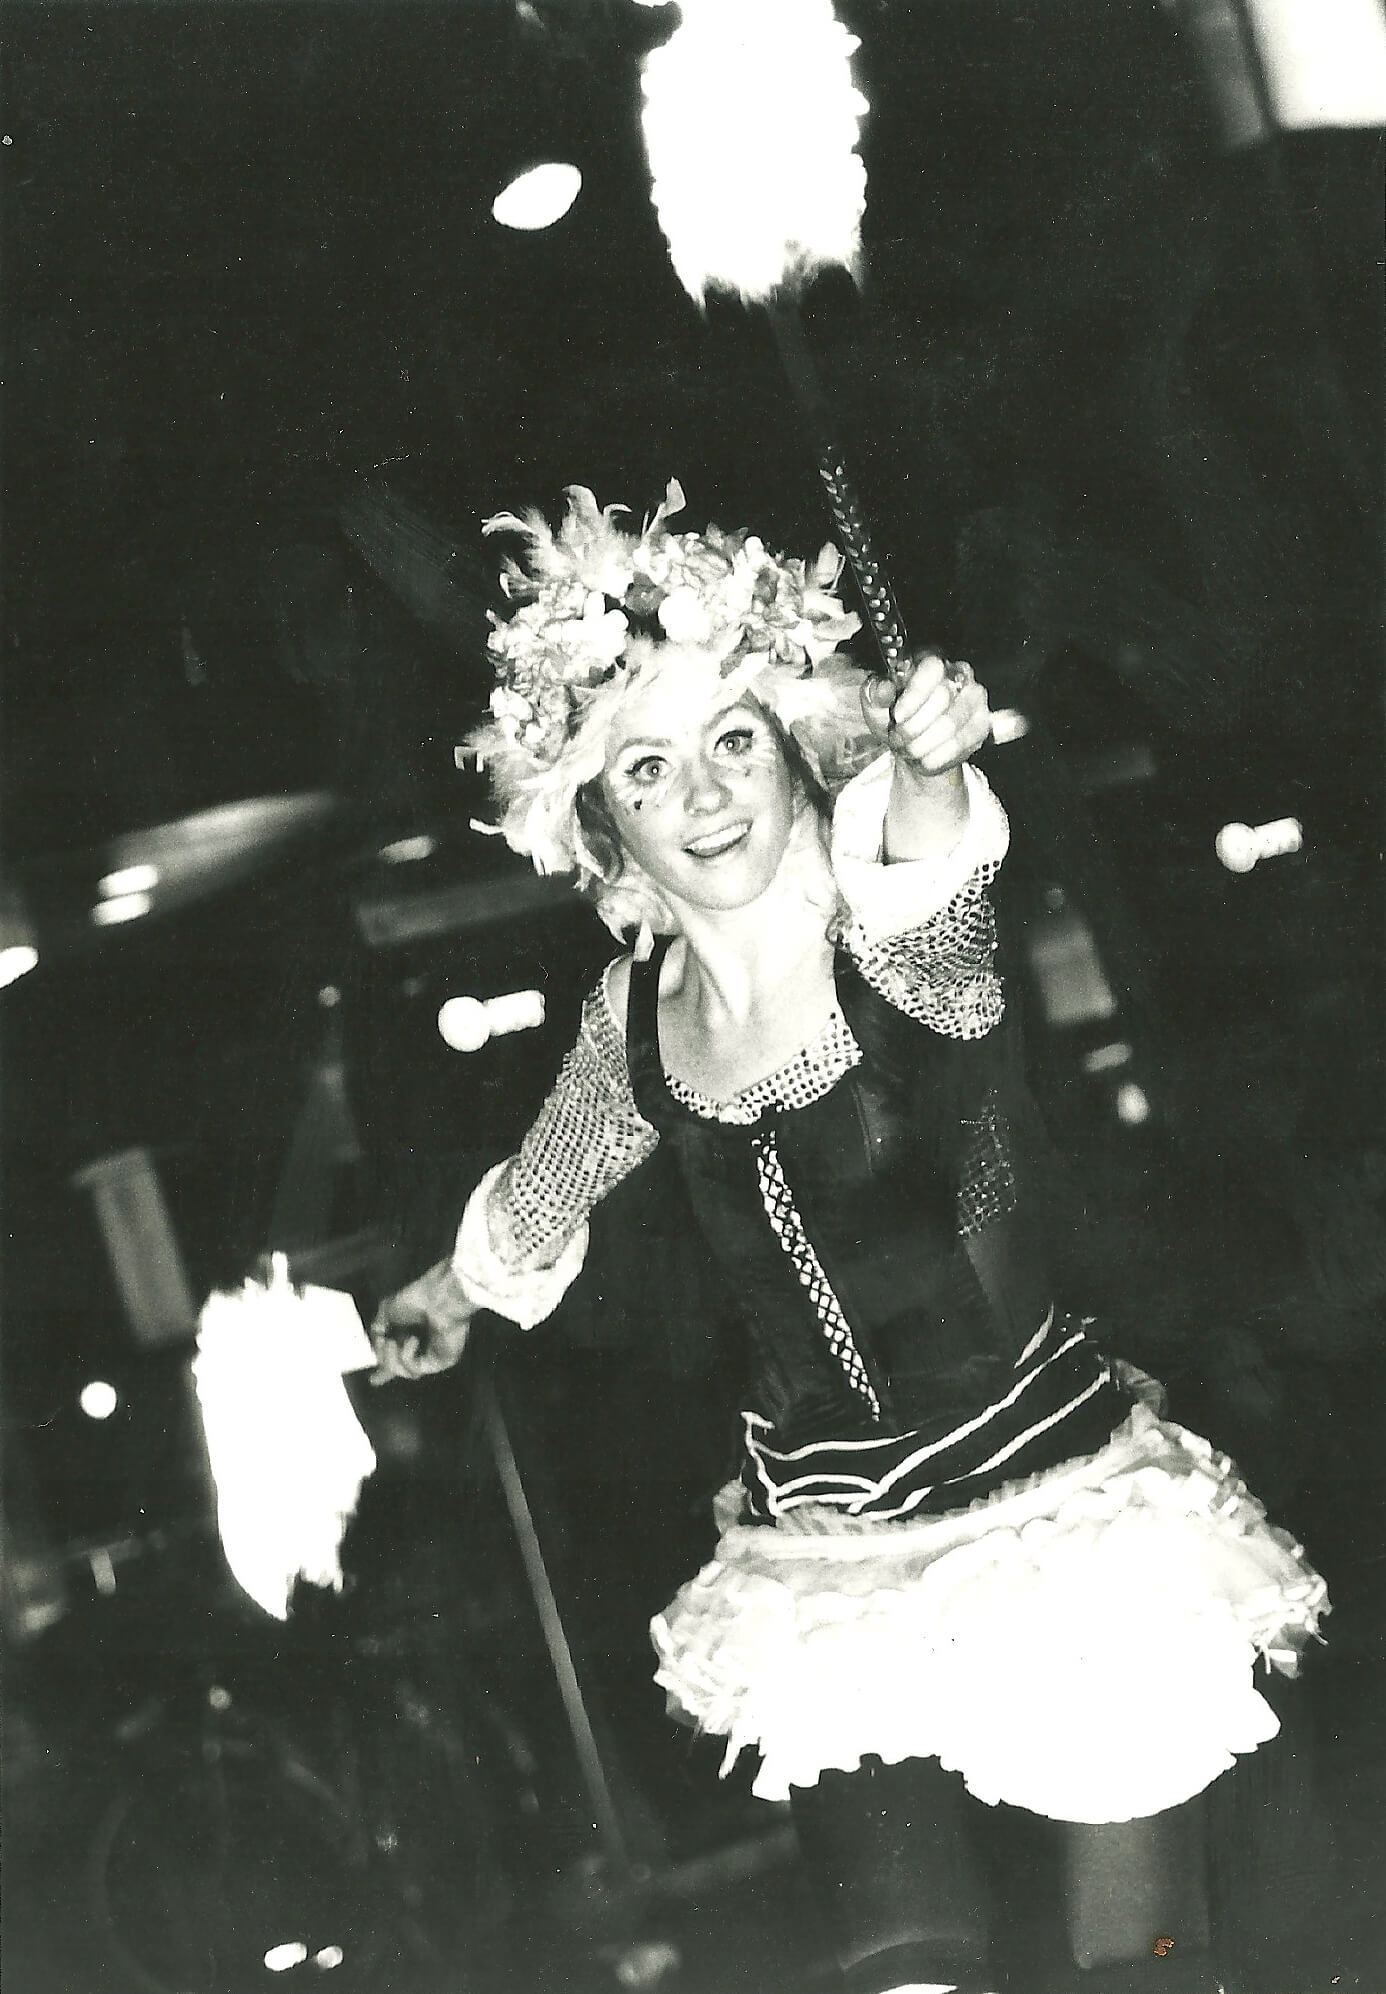 Street Theatre Tour, Japan, 1996